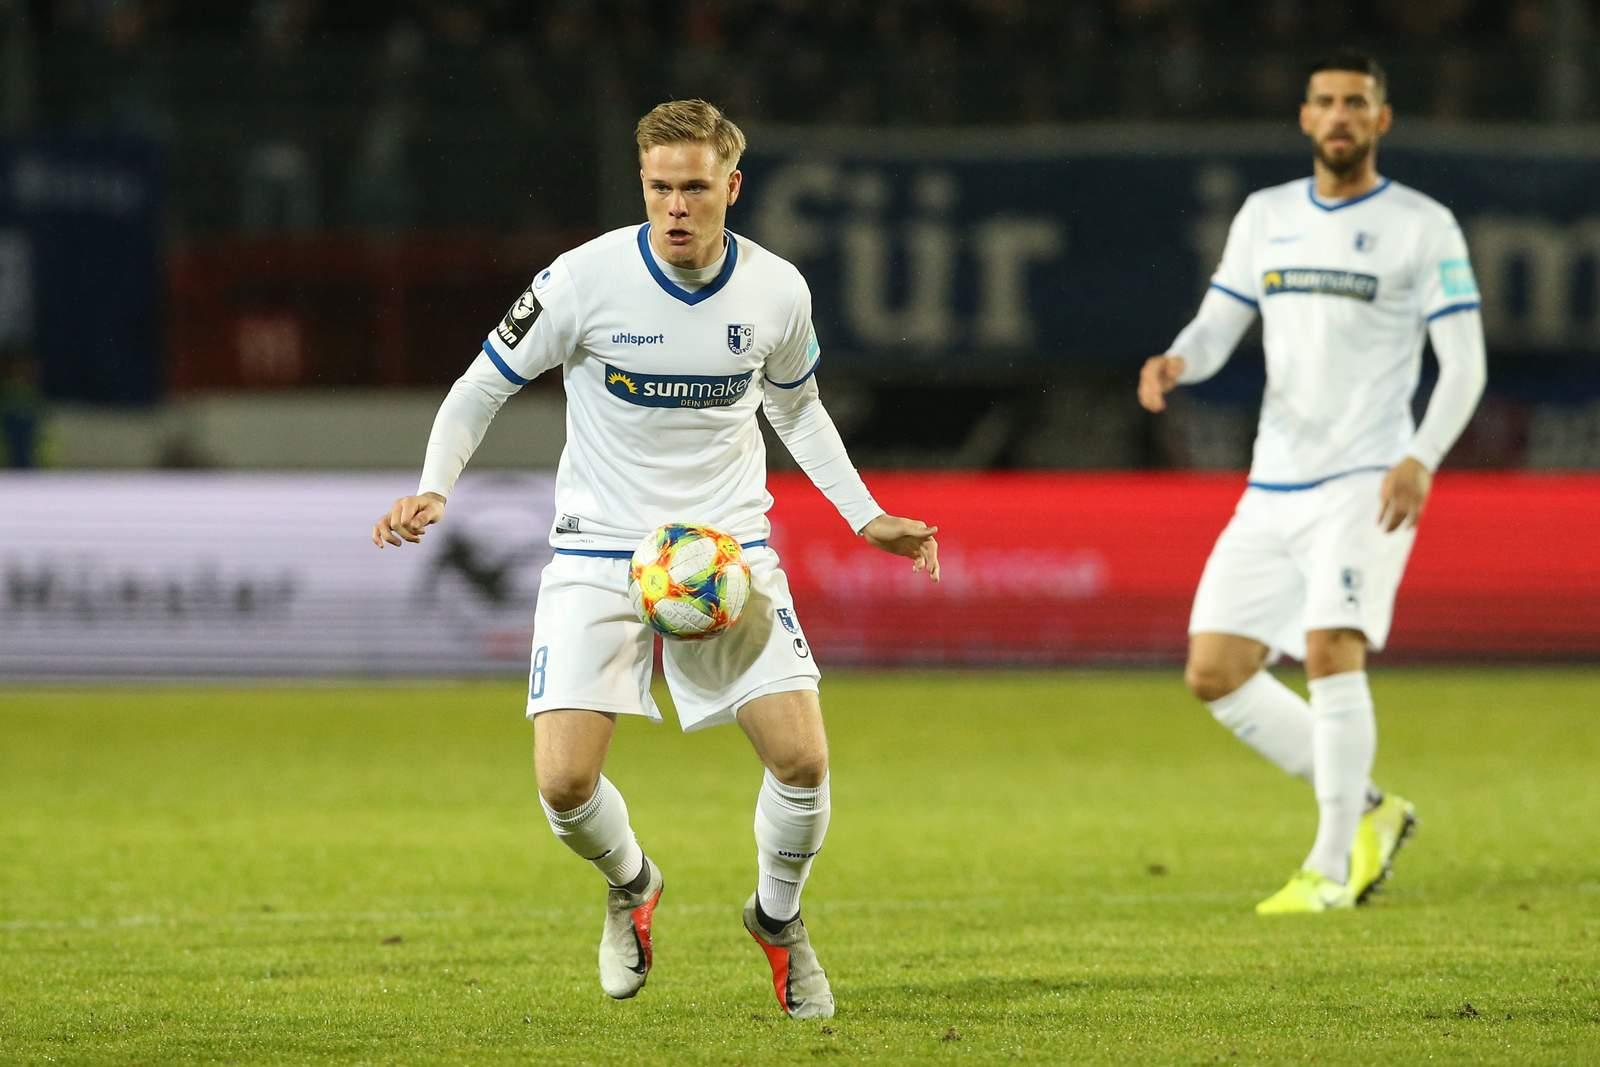 Thore Jacobsen vom 1. FC Magdeburg